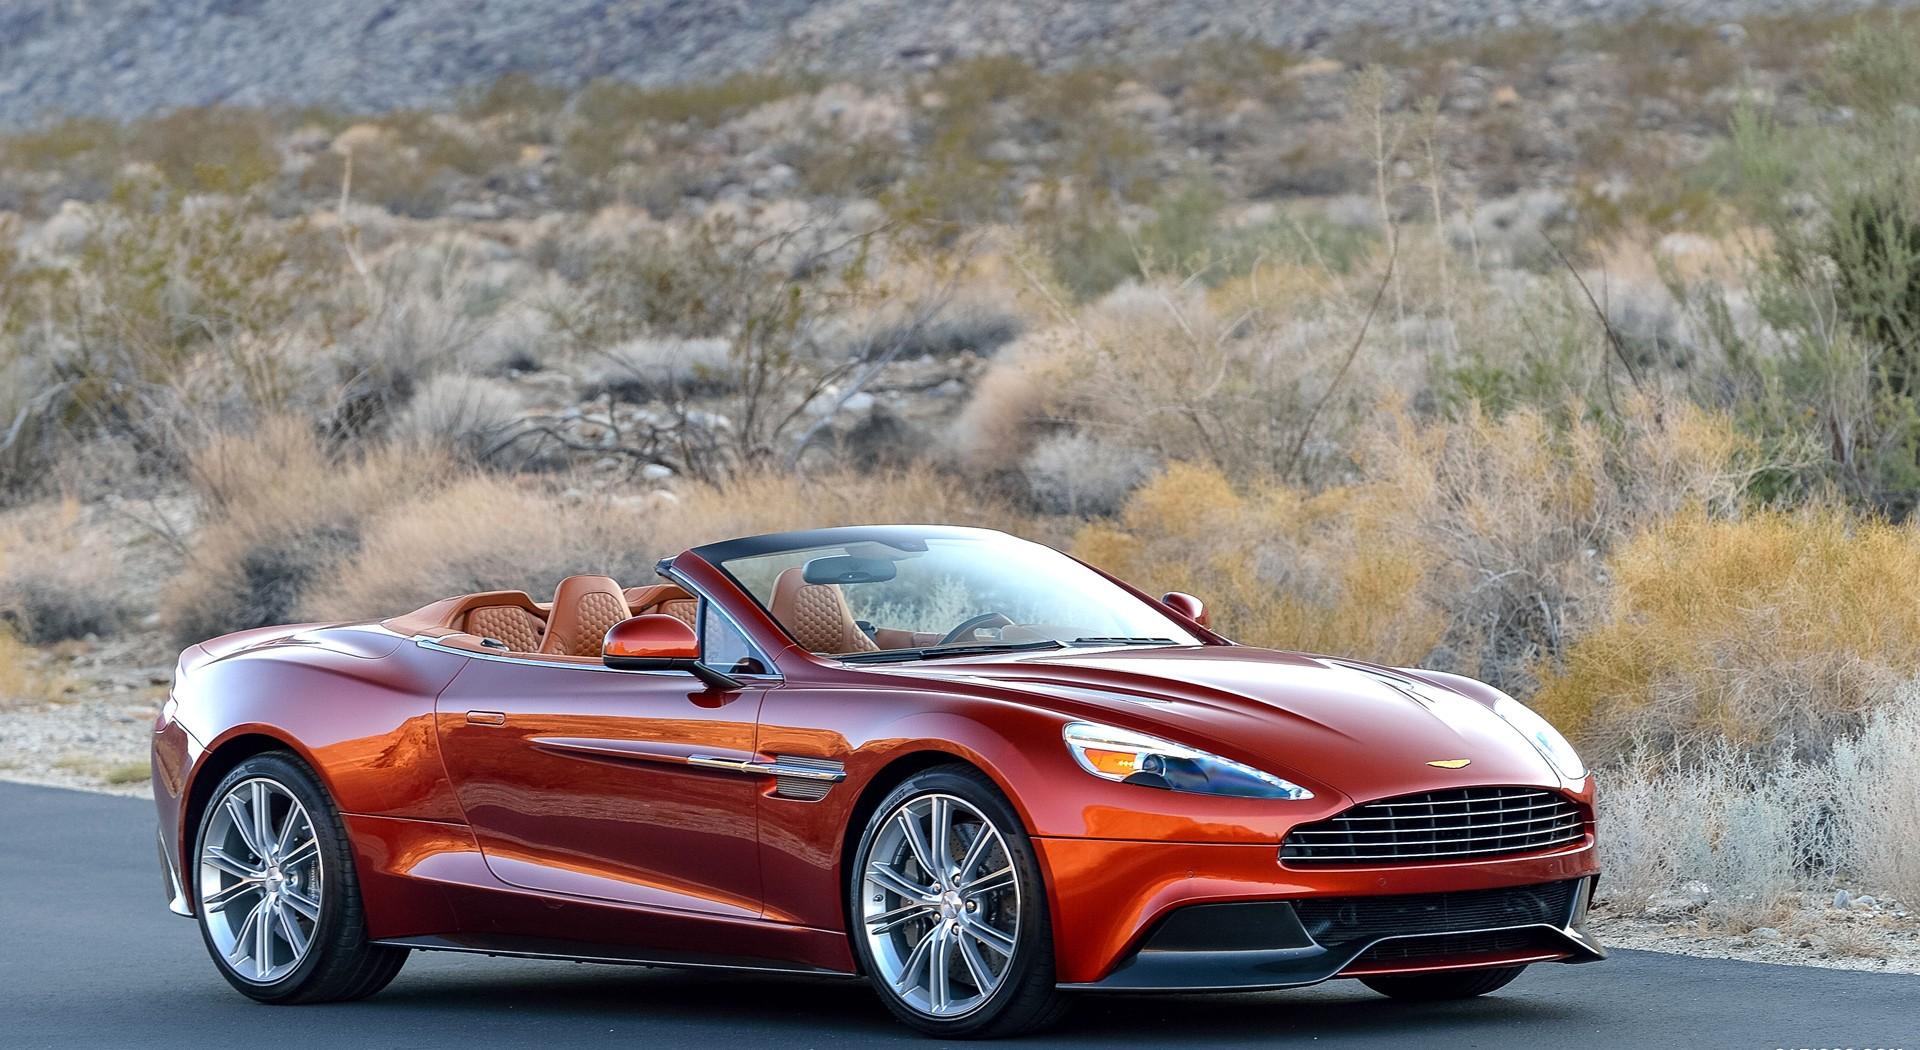 Aston Martin Vanquish yhd